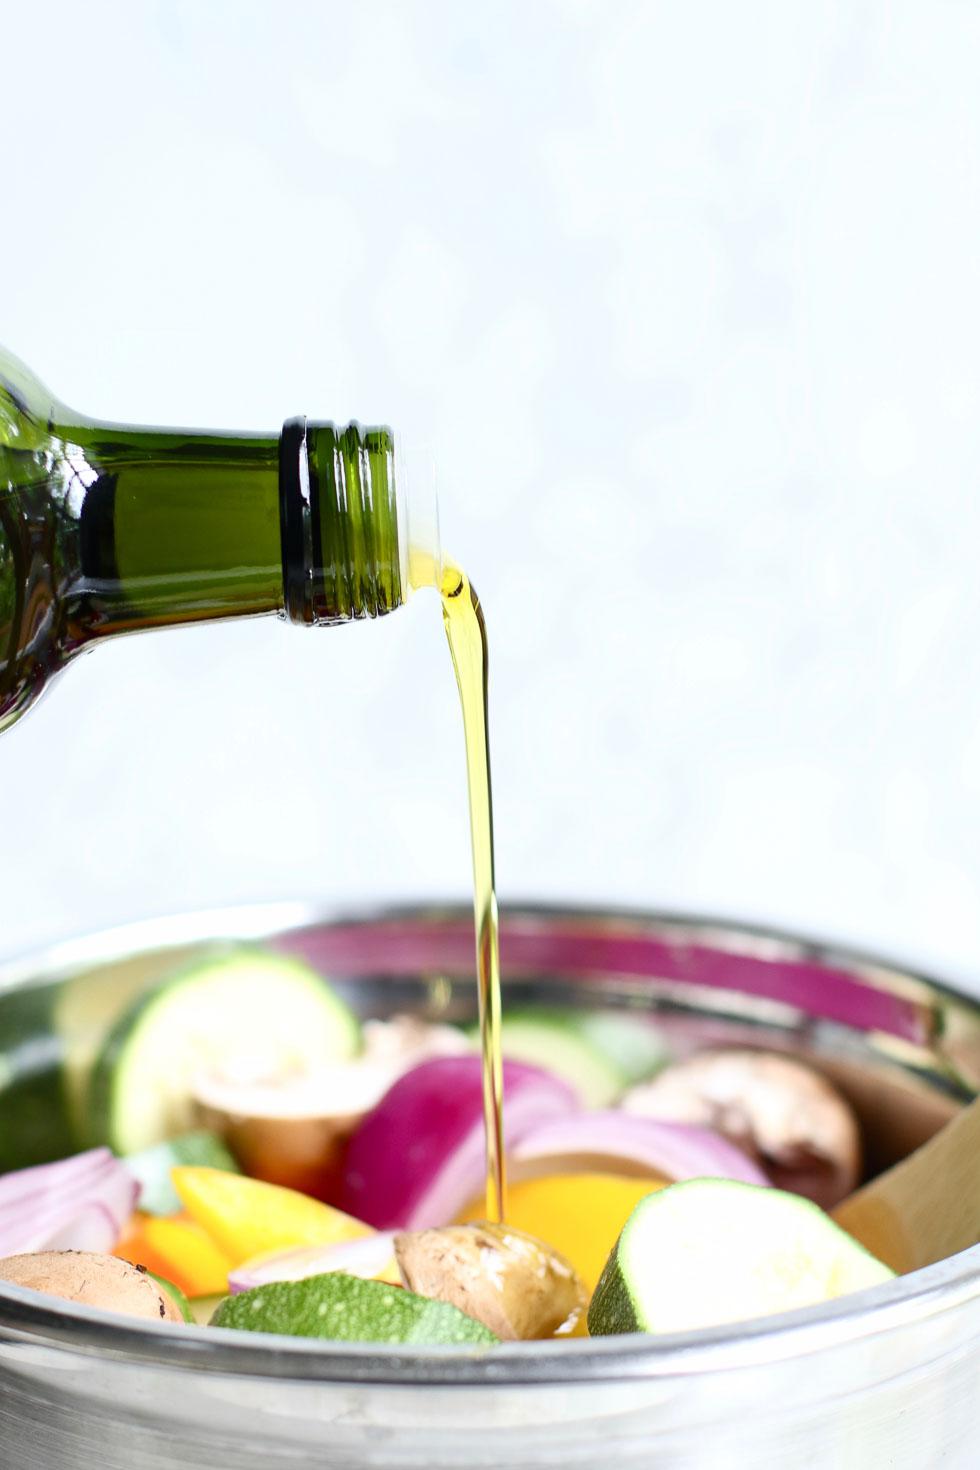 Pouring olive oil on vegetables